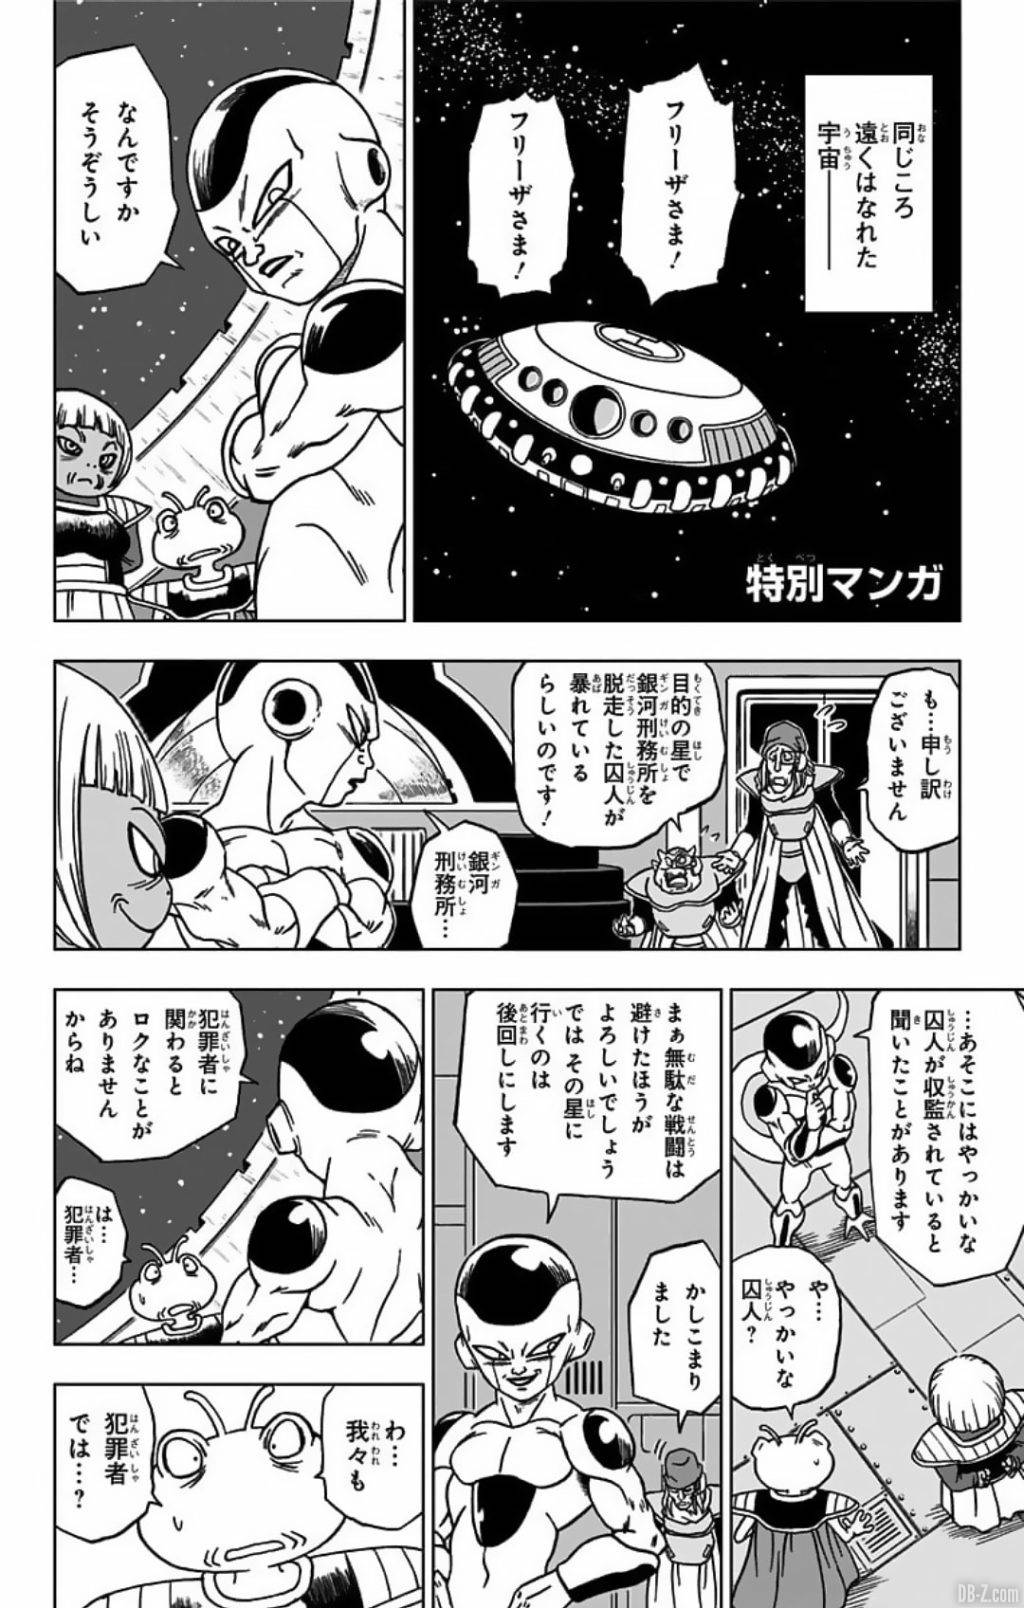 Dragon Ball Super Tome 12 page bonus 1